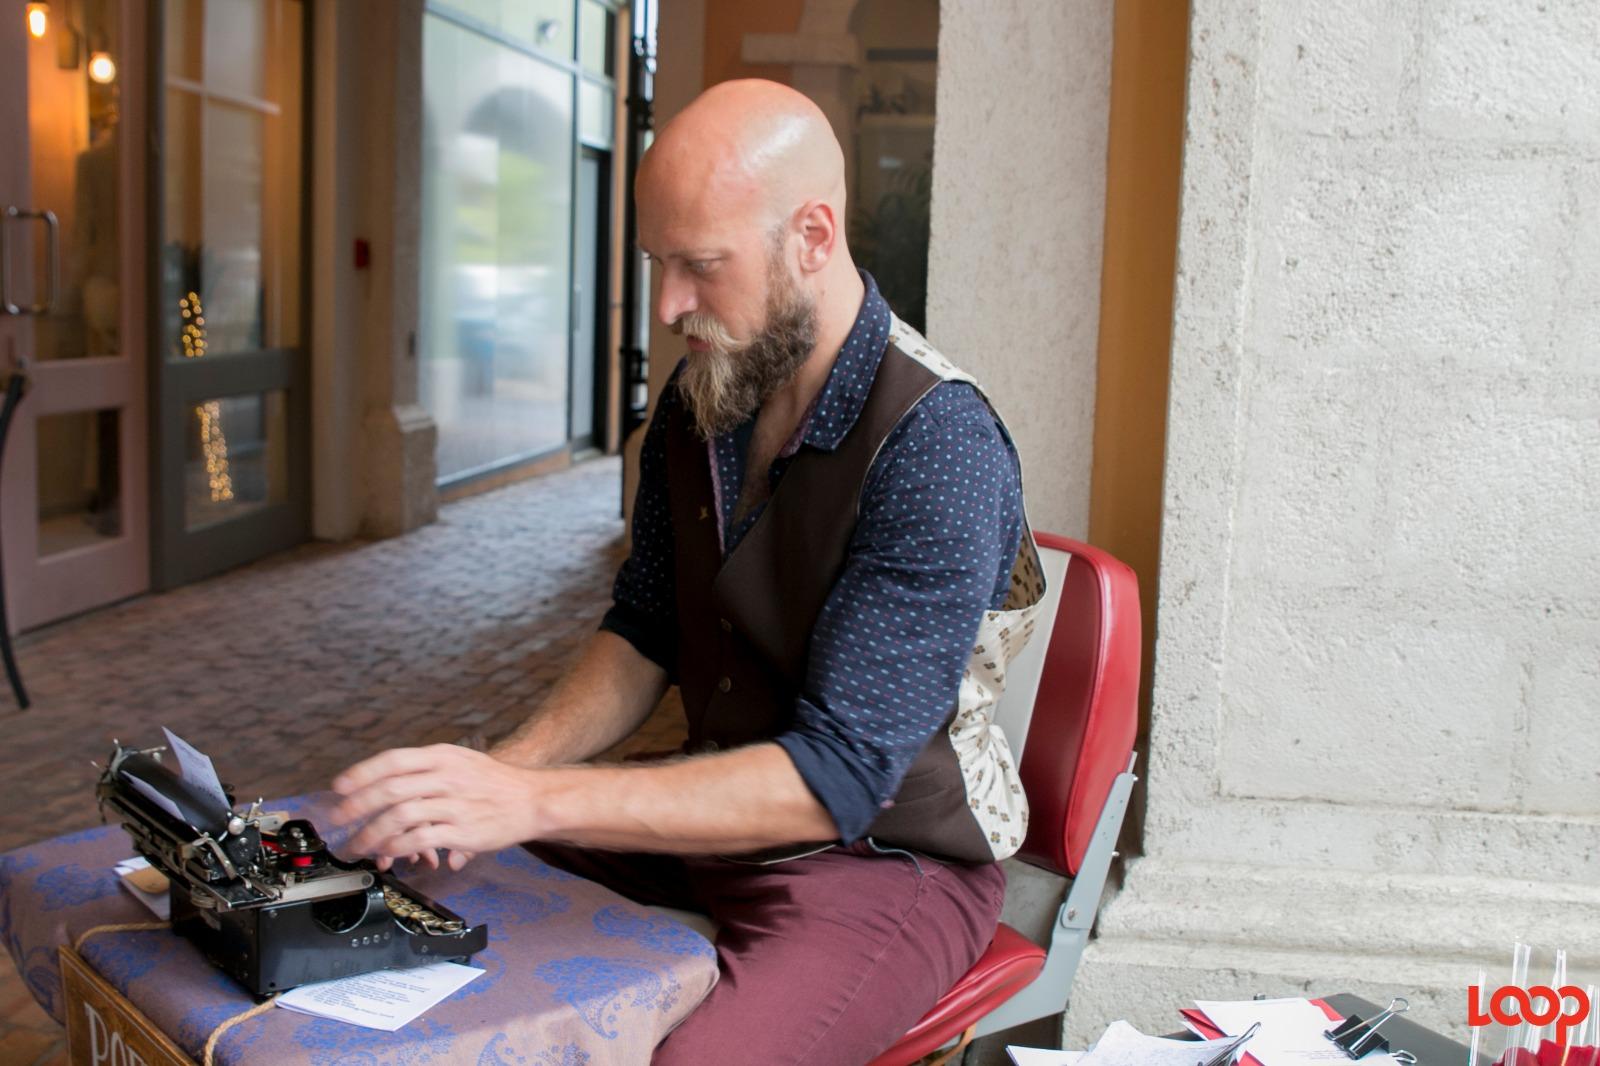 Itinerant poet Kevin Daveny